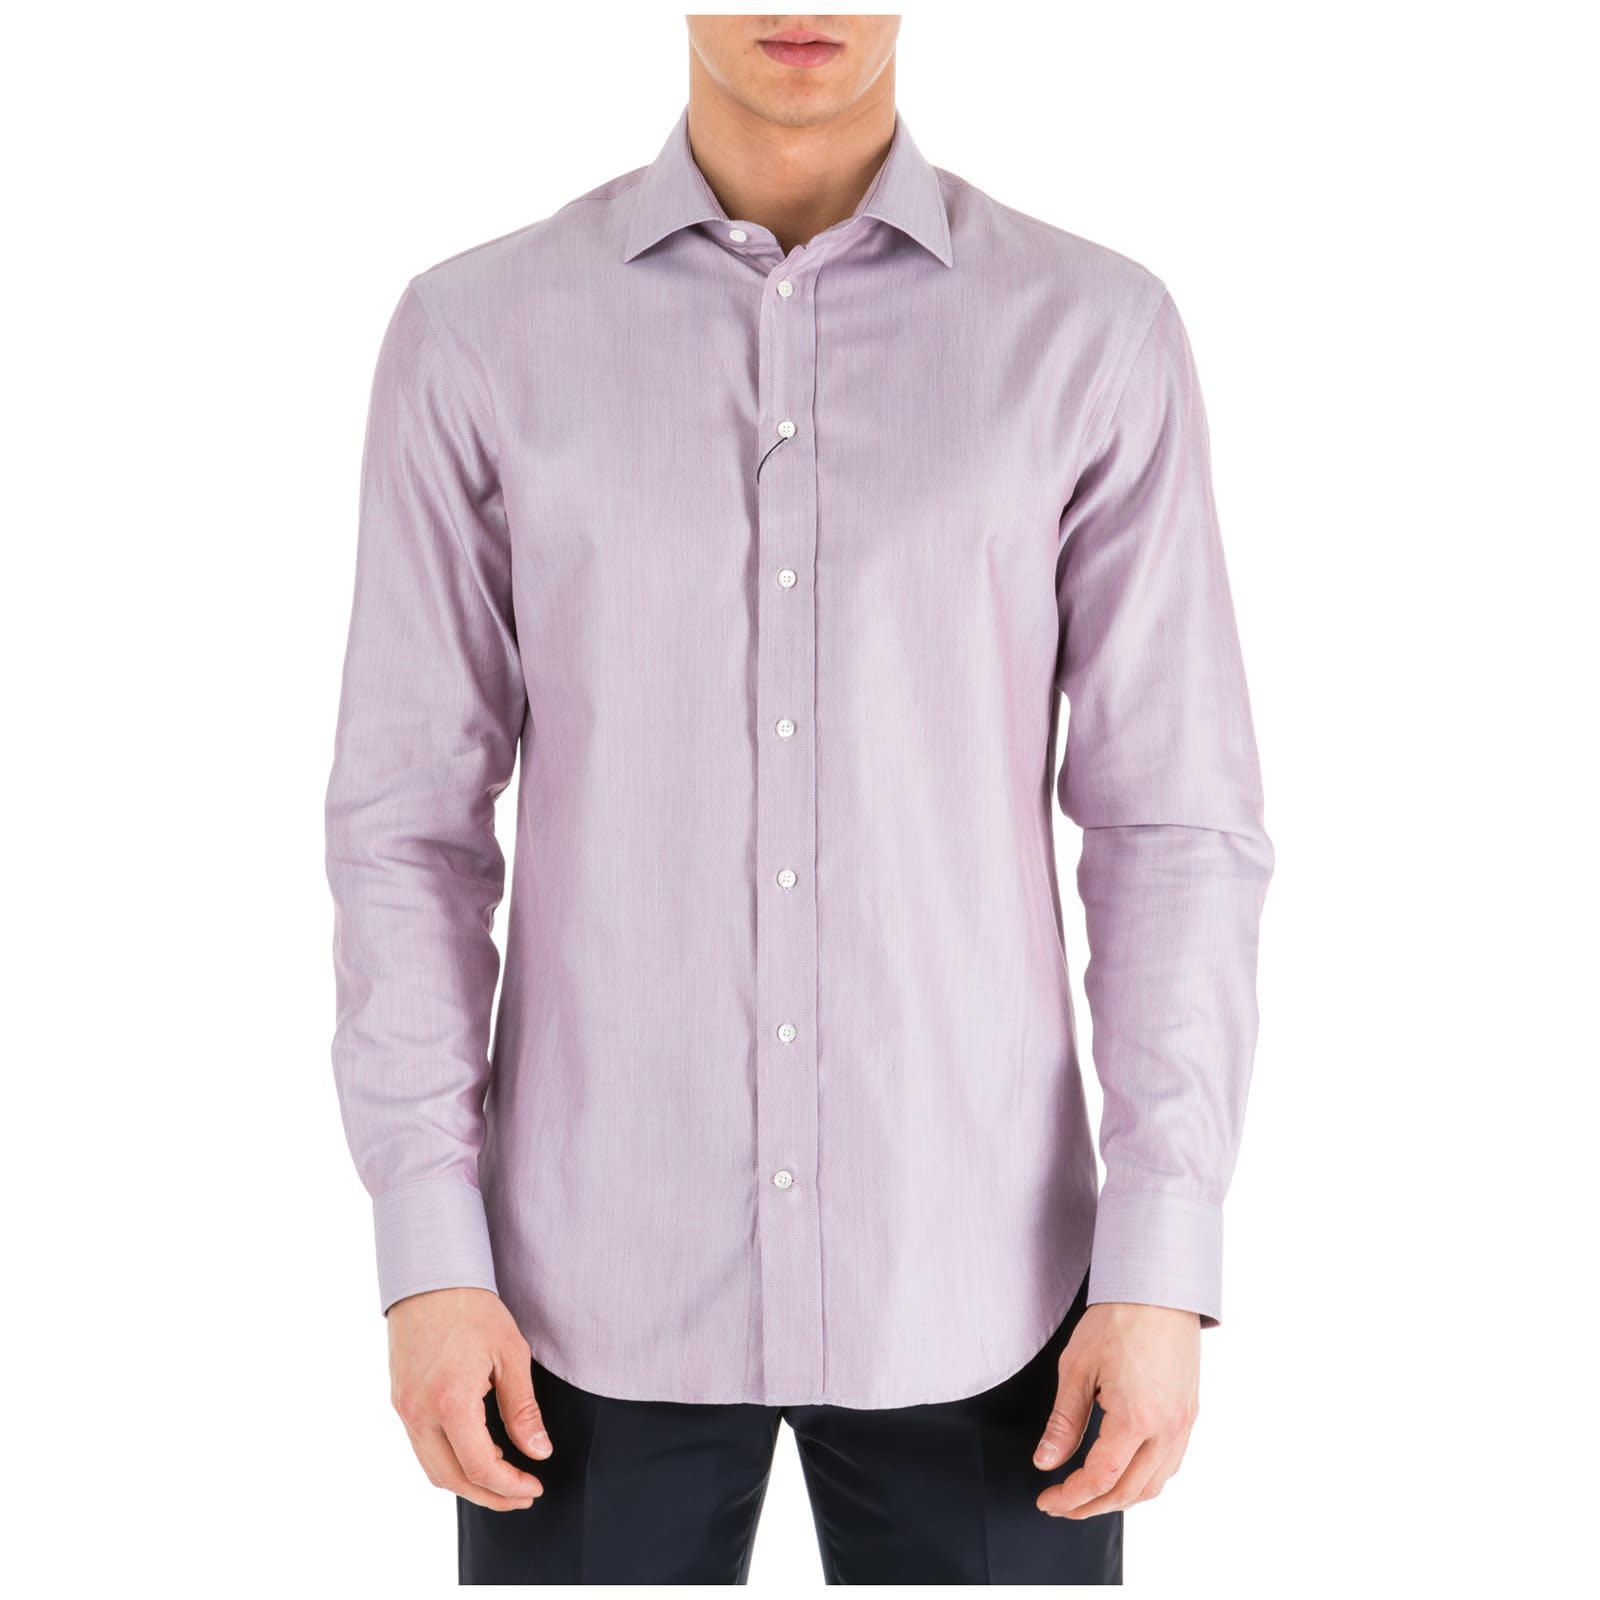 cheap for discount 96bc3 057ba Best price on the market at italist | Emporio Armani Emporio Armani  Herrenhemd Hemd Herren Langarm Langarmhemd Modern Fit